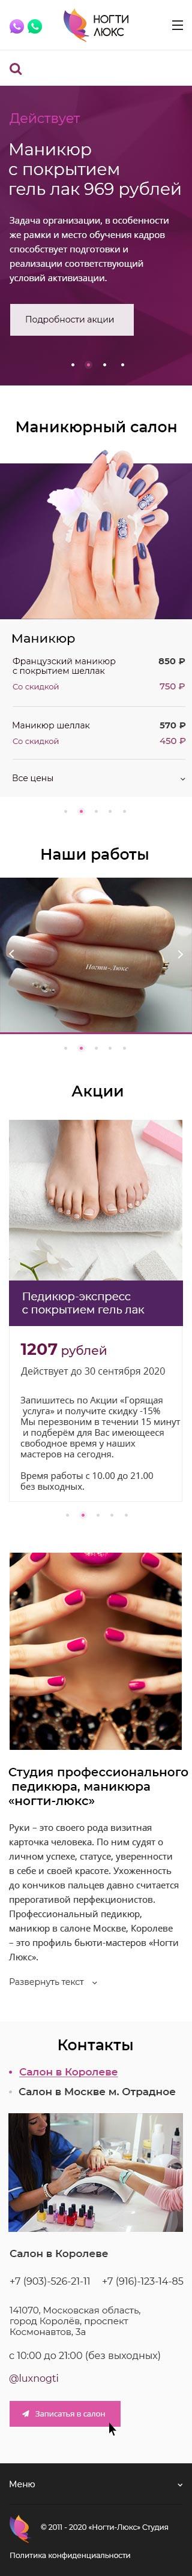 сайт салона красоты пример Ногти люкс 320 px